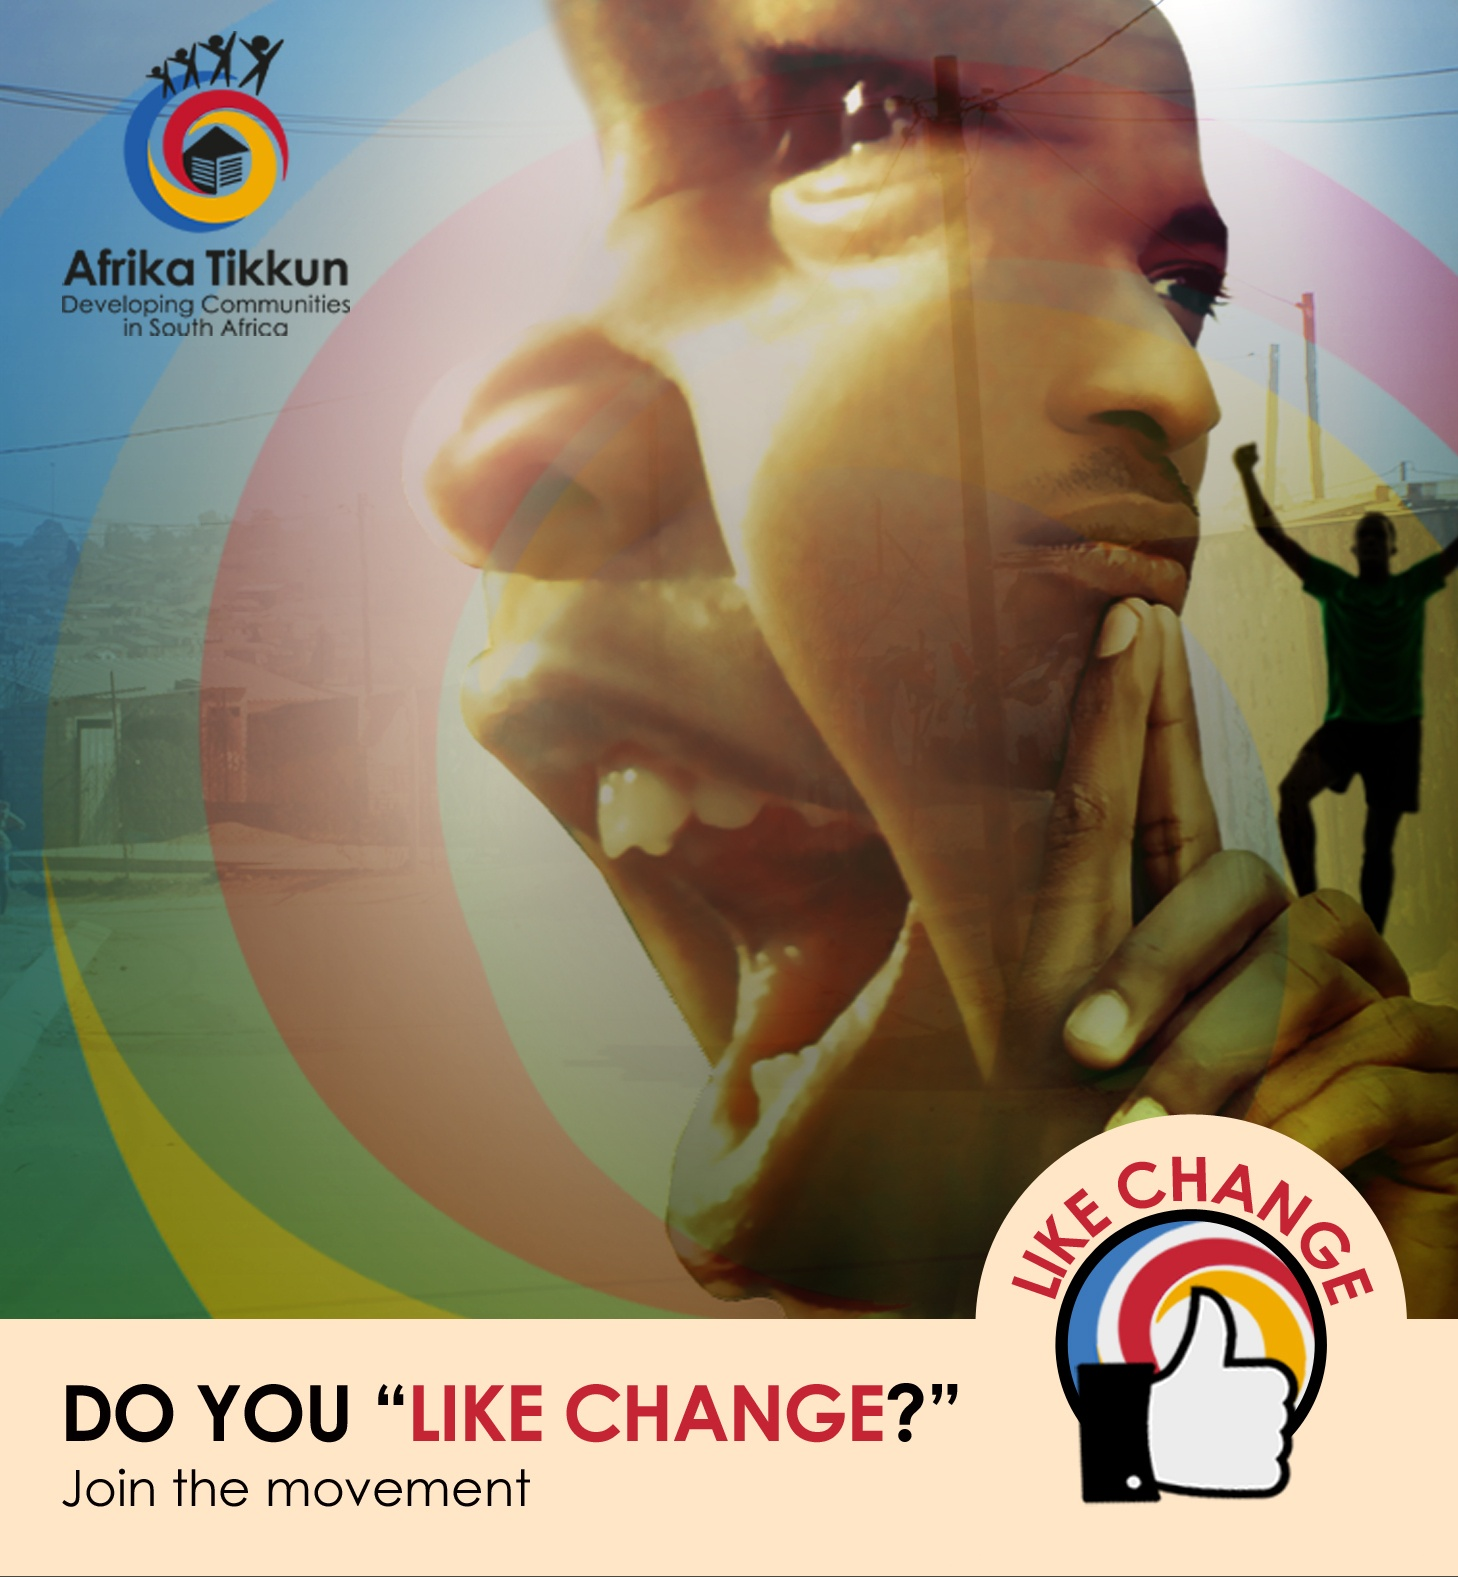 AfrikaTikkunLike Change Jpeg Image.jpg